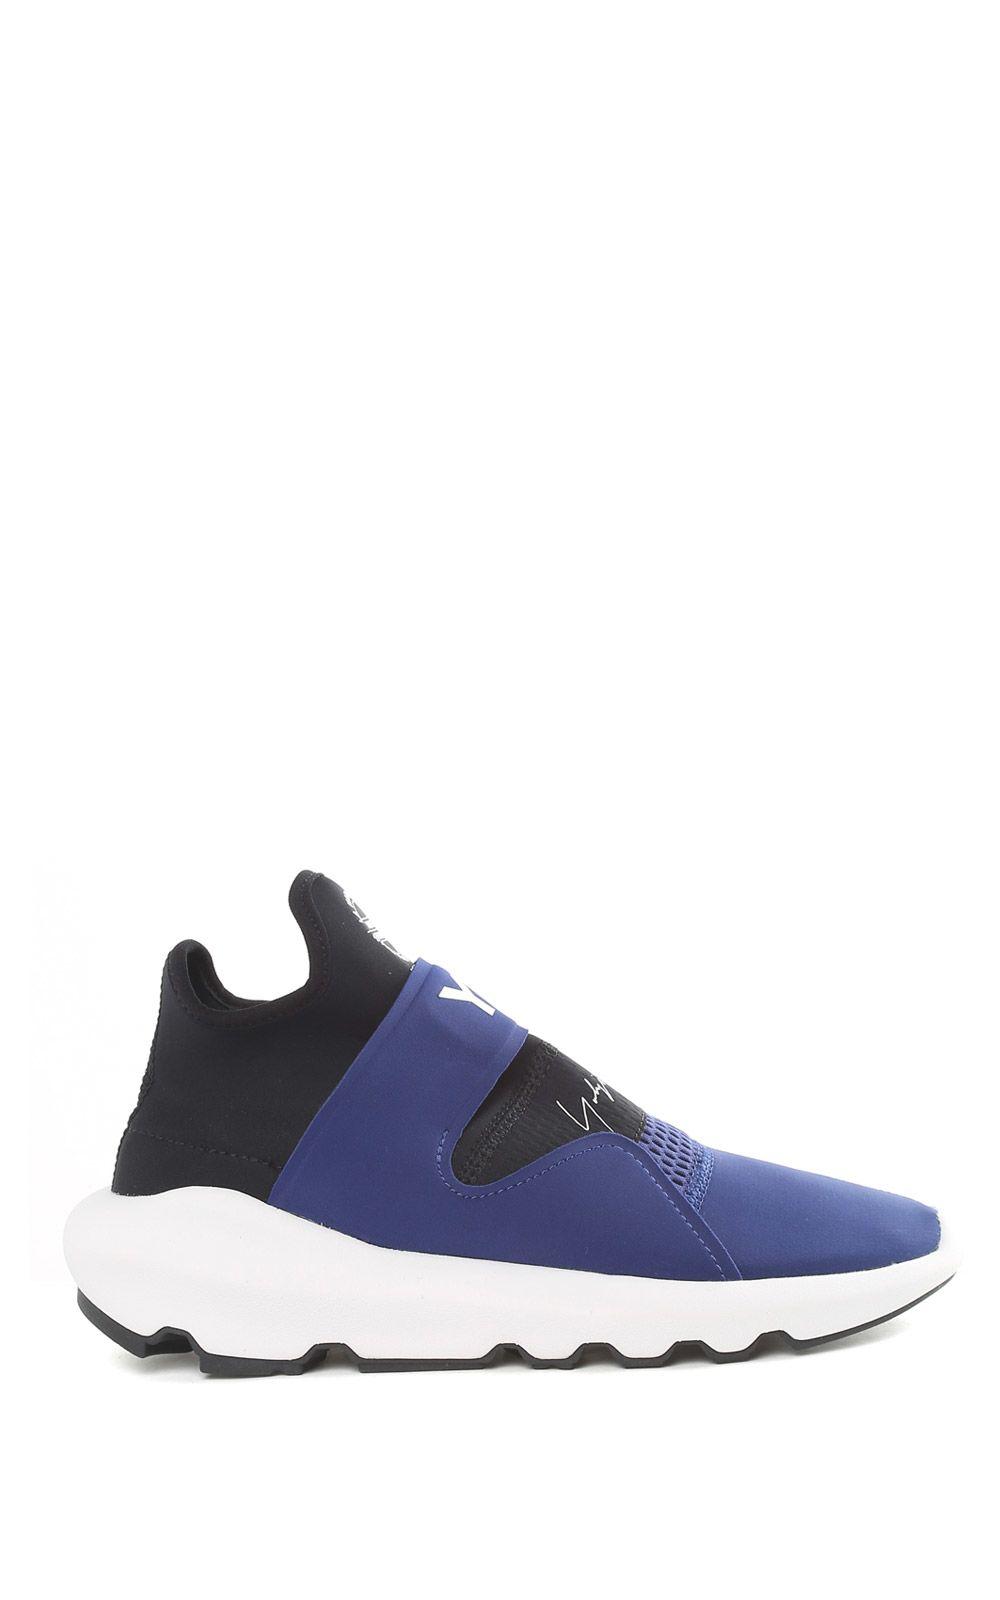 Y-3 Suberou Suede And Neoprene Sneakers